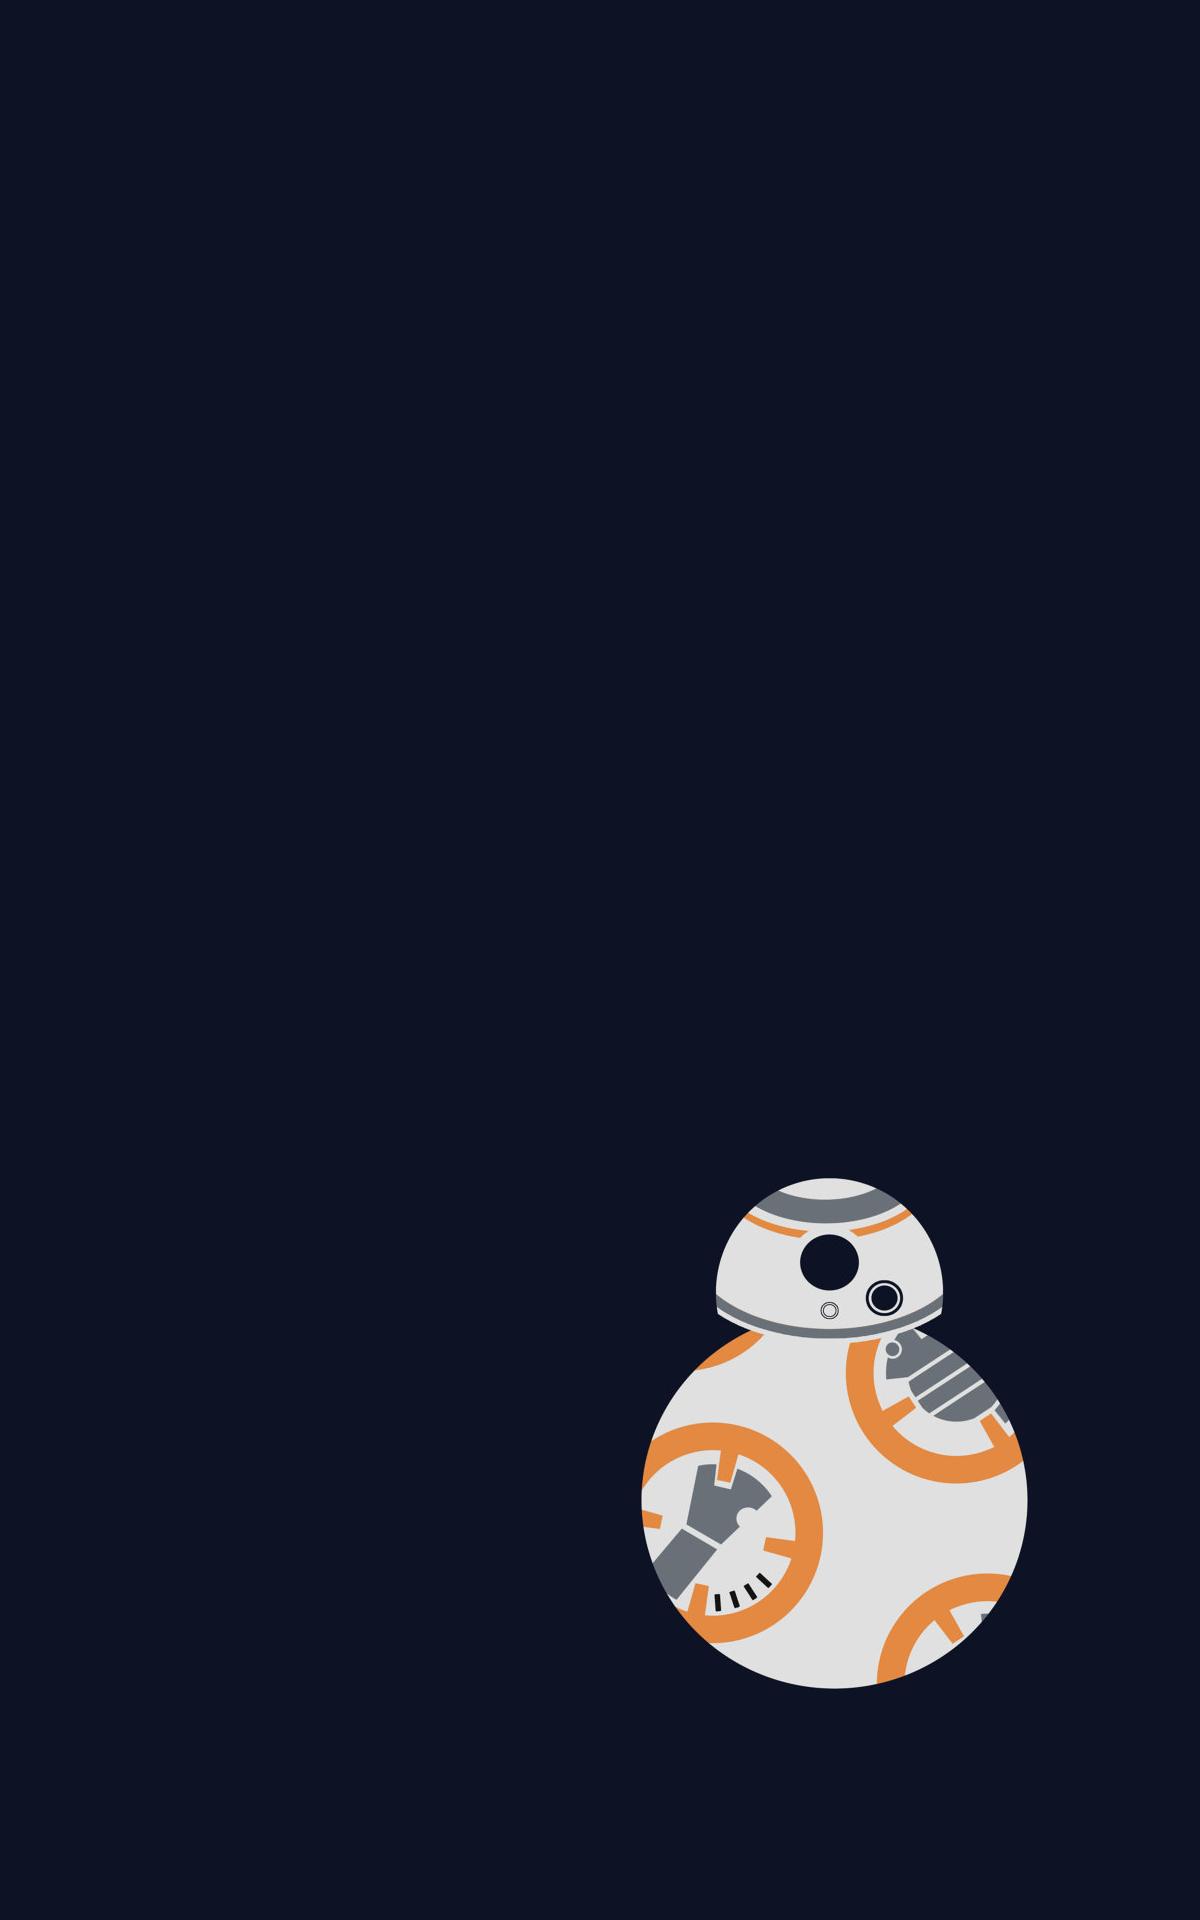 Wallpaper Illustration Star Wars Robot Minimalism Portrait Display Logo Cartoon Star Wars The Force Awakens Bb 8 Computer Wallpaper 1200x1920 Criseva01 58235 Hd Wallpapers Wallhere